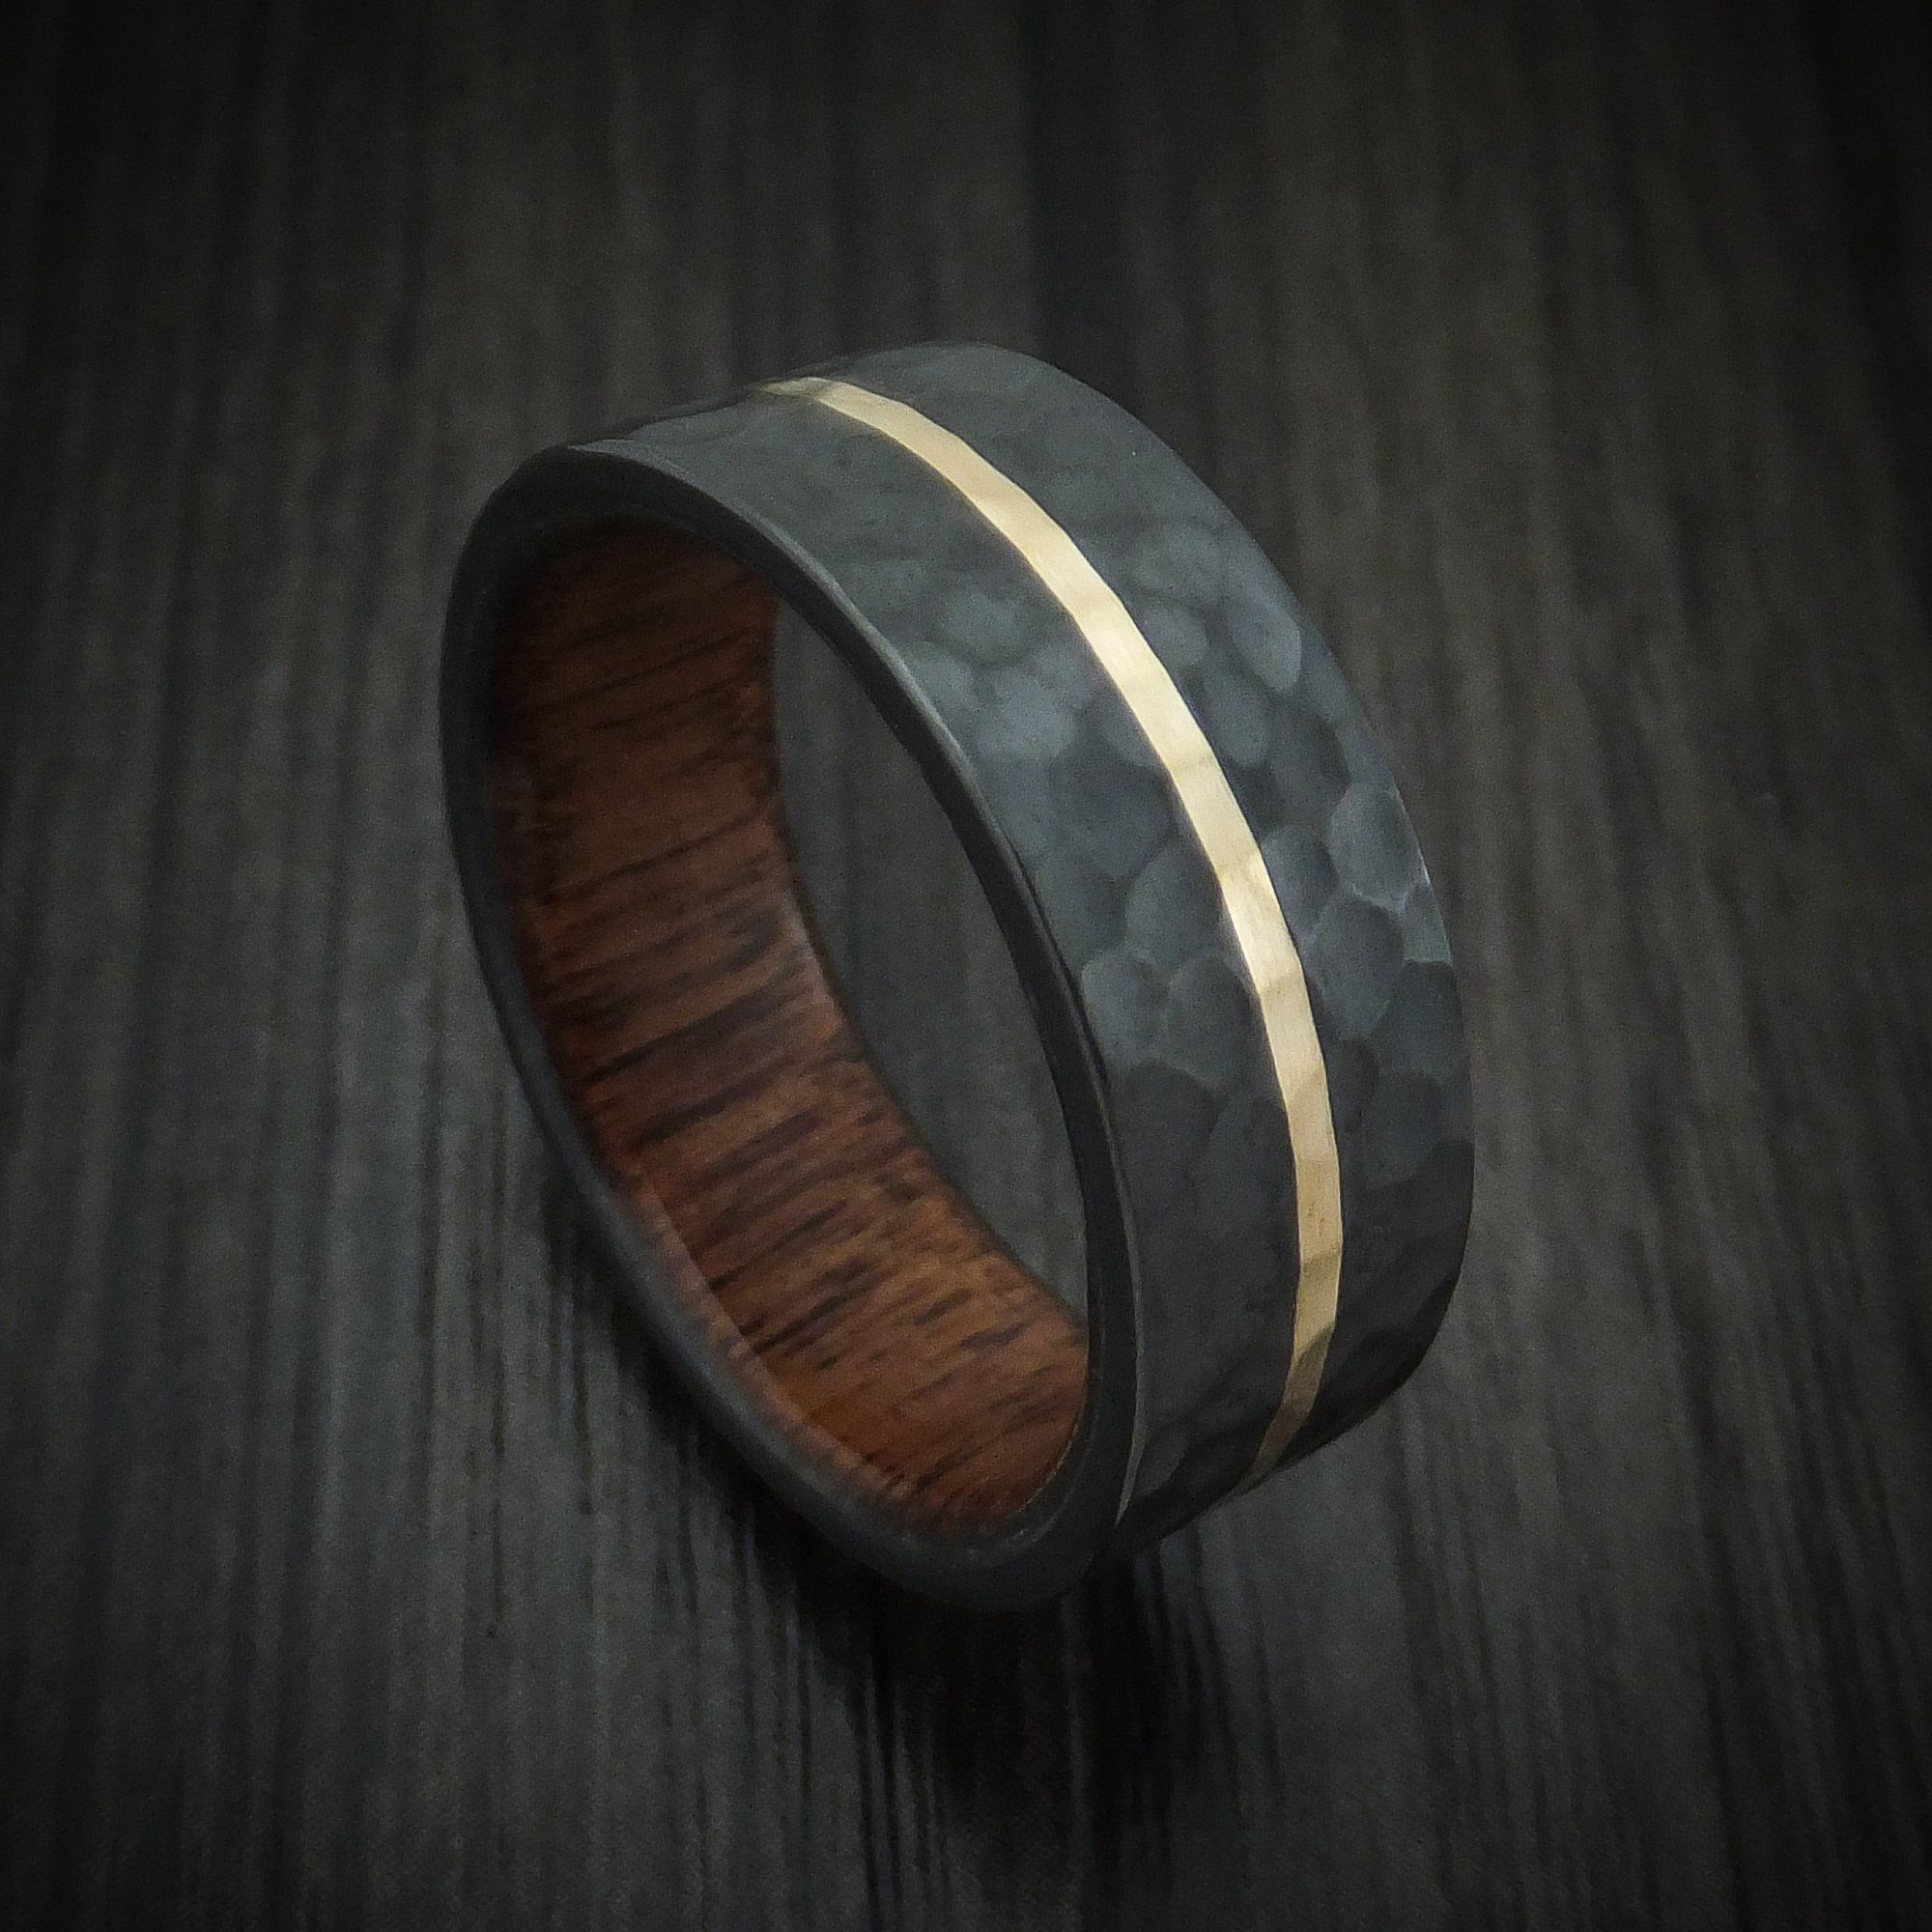 Black Zirconium Ring with 14K Gold and Wood Sleeve Custom